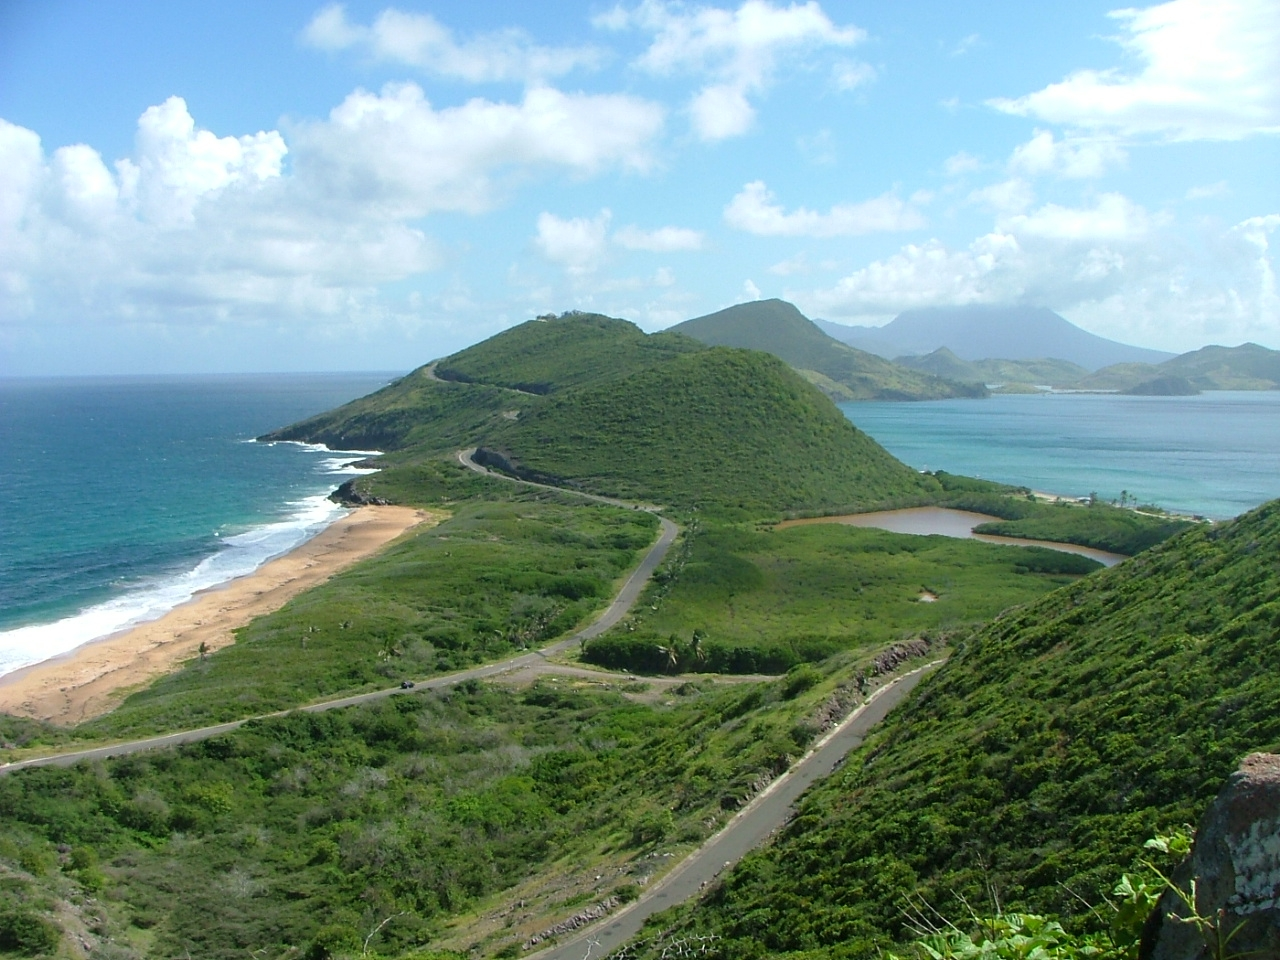 FlyerTalk Forums - Celebrity passengers robbed on St. Kitts